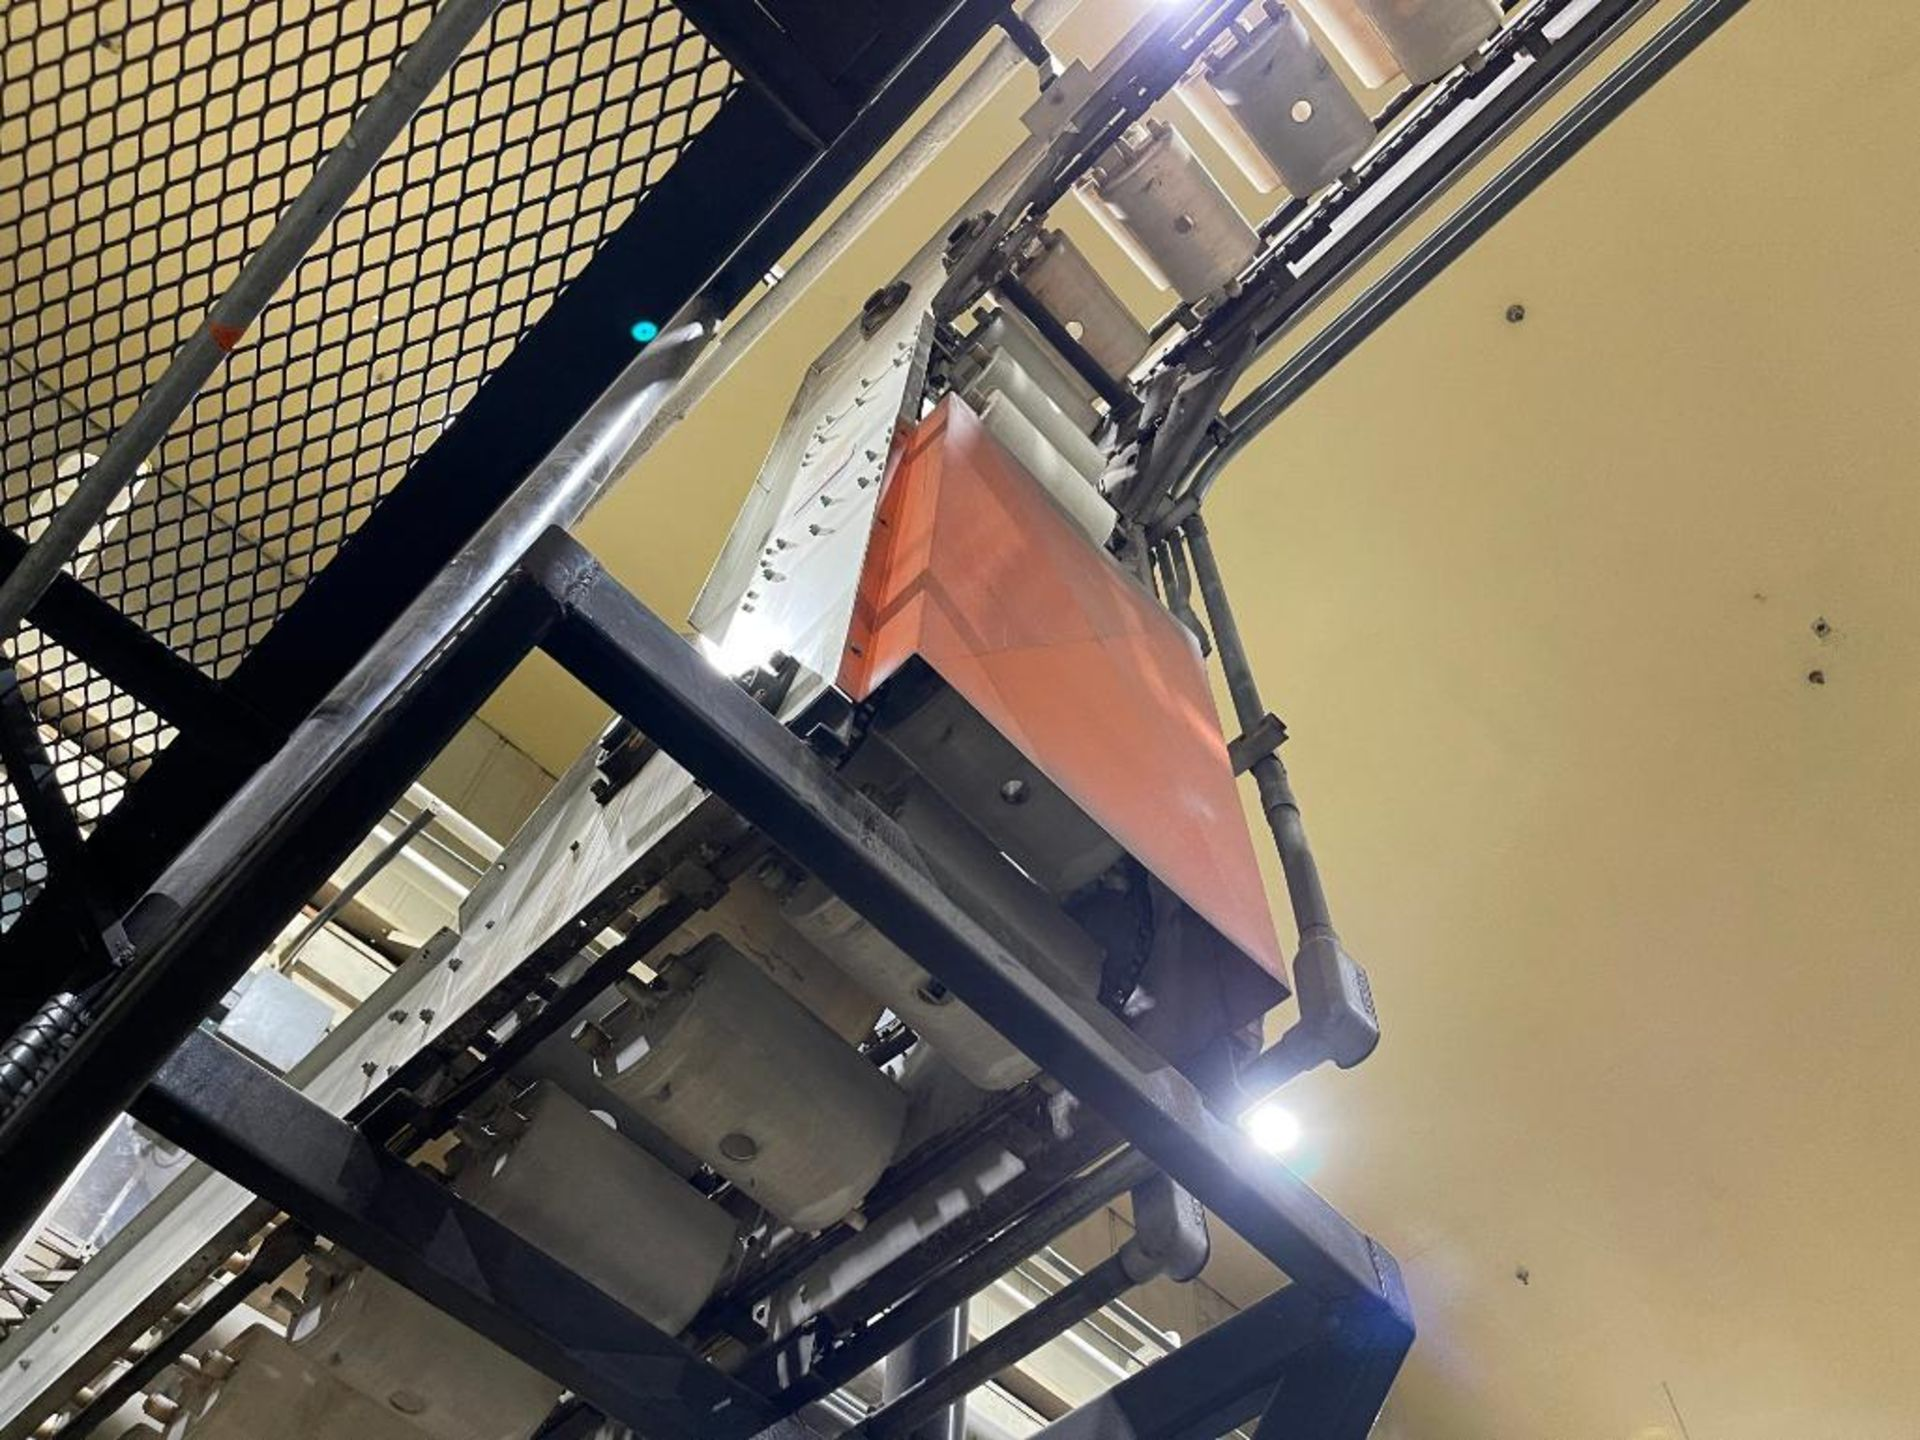 Meyer horizontal bucket elevator, model PC-072-12-BCC - Image 13 of 18